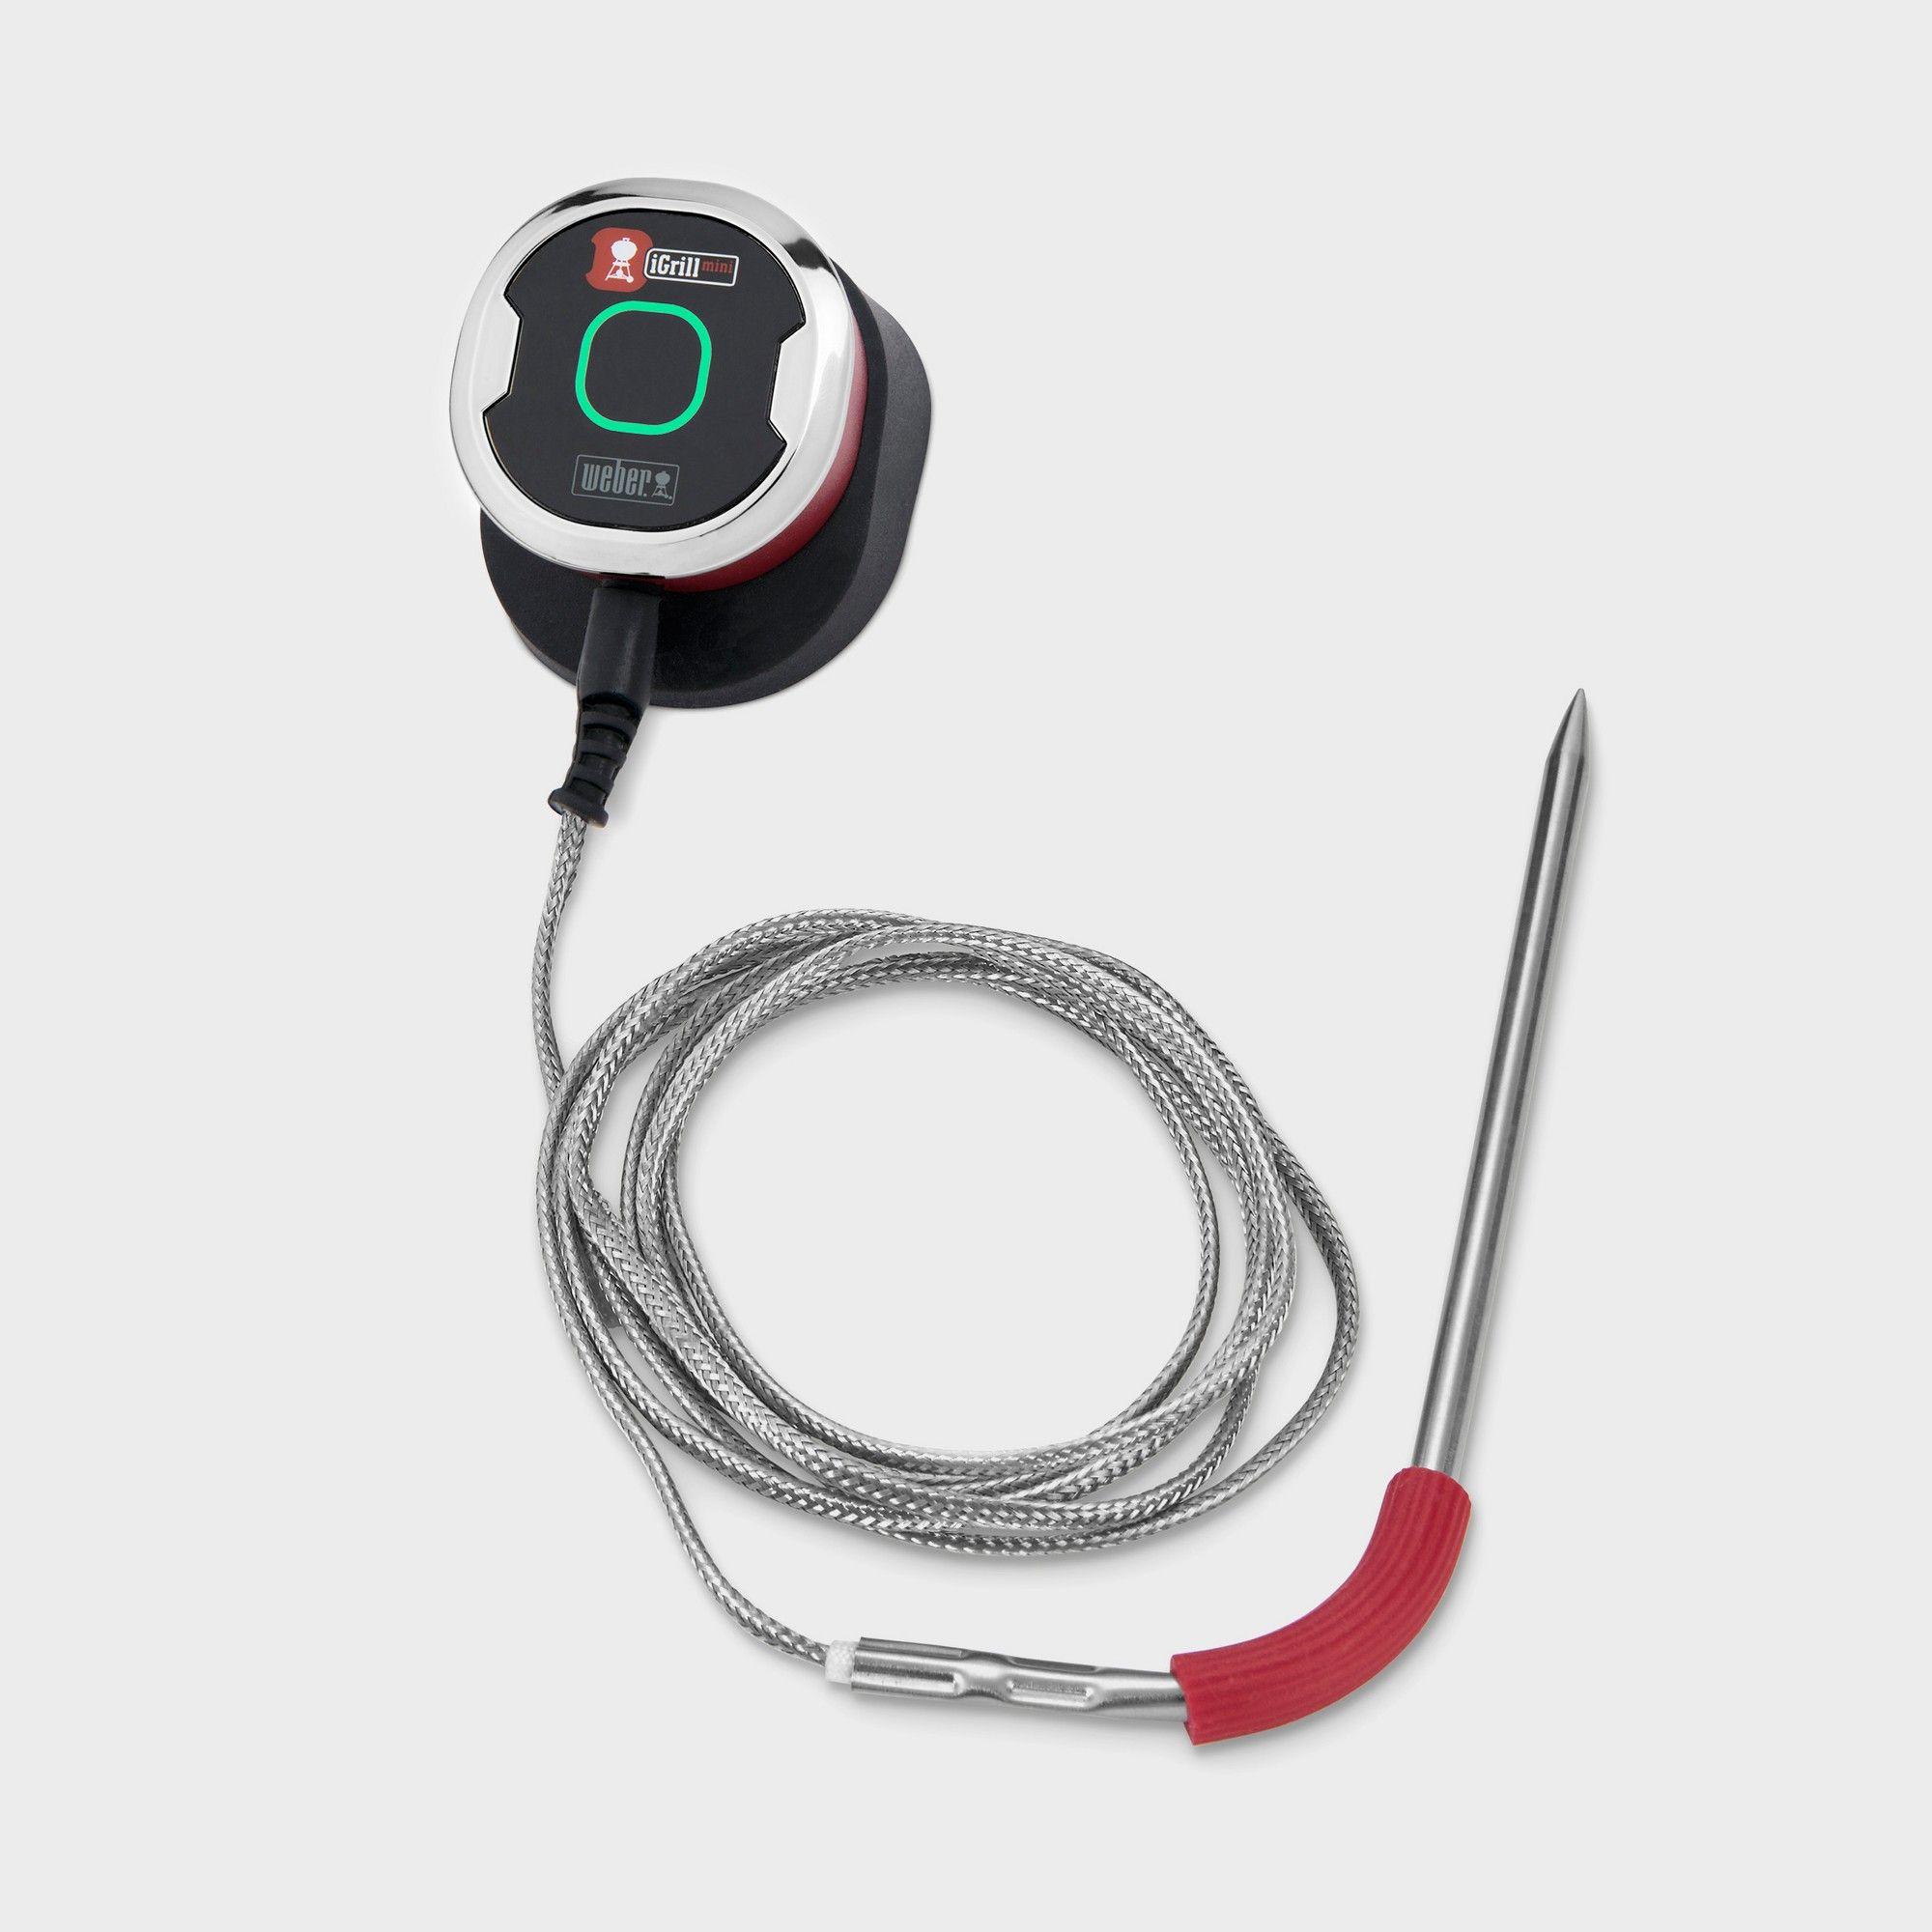 Weber iGrill Mini Digital Bluetooth Thermometer, Black